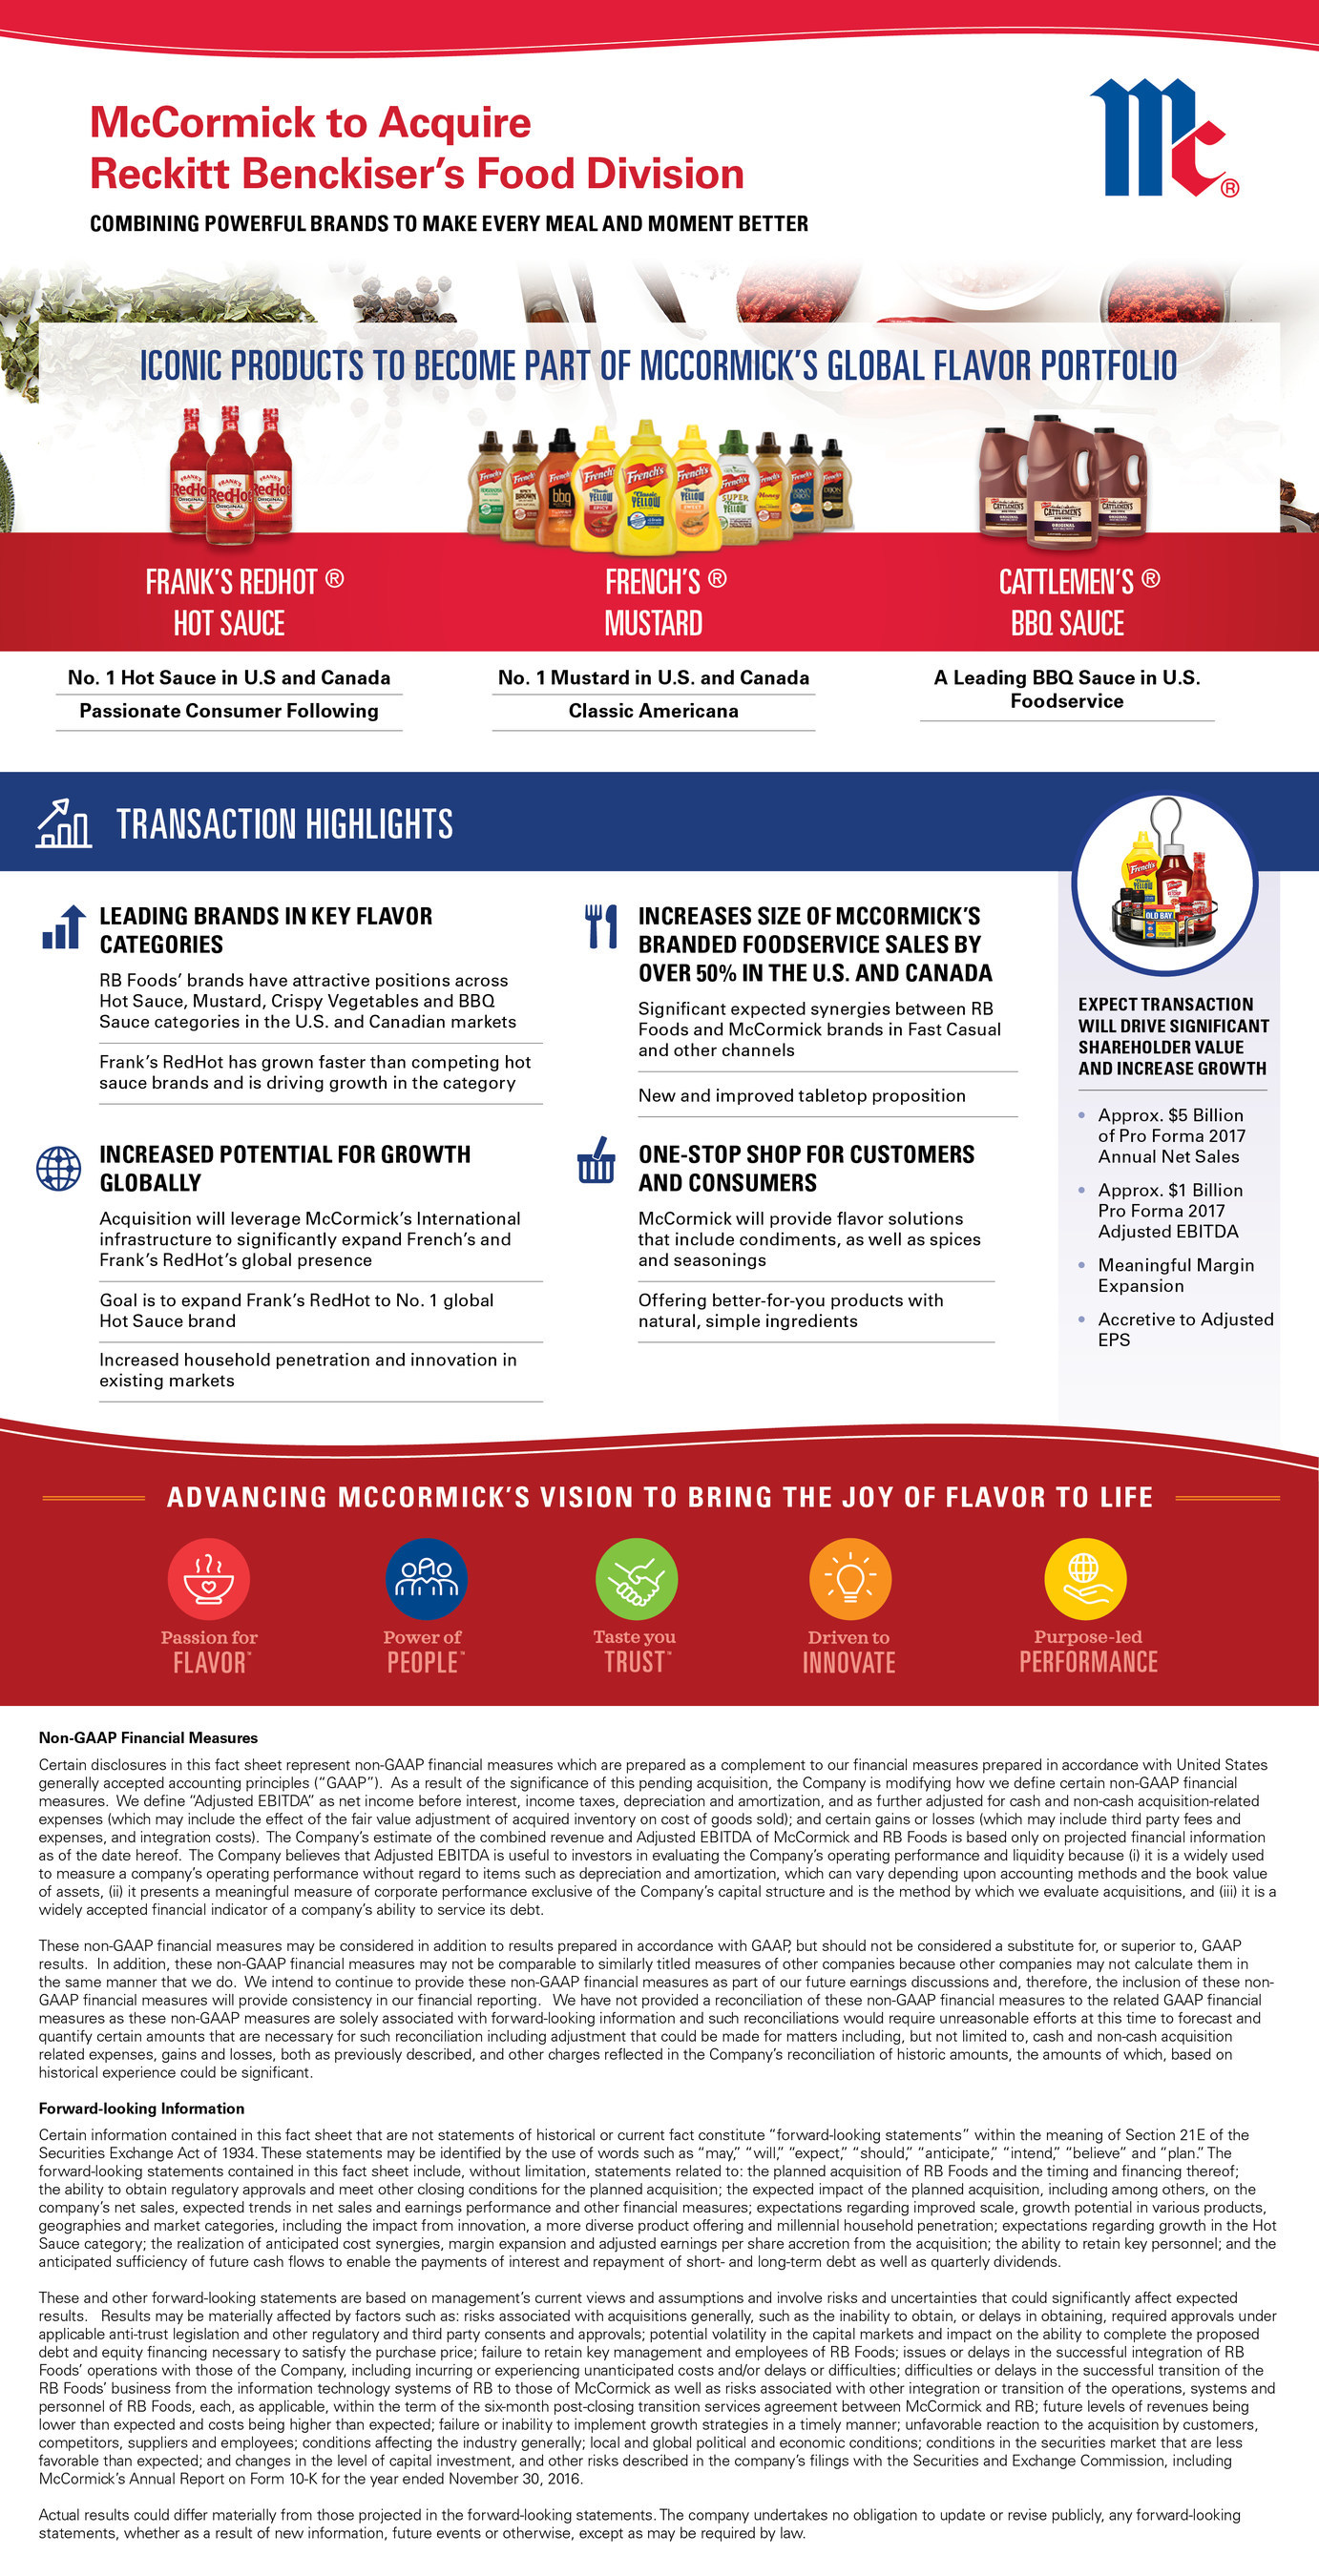 McCormick Acquisition Fact Sheet